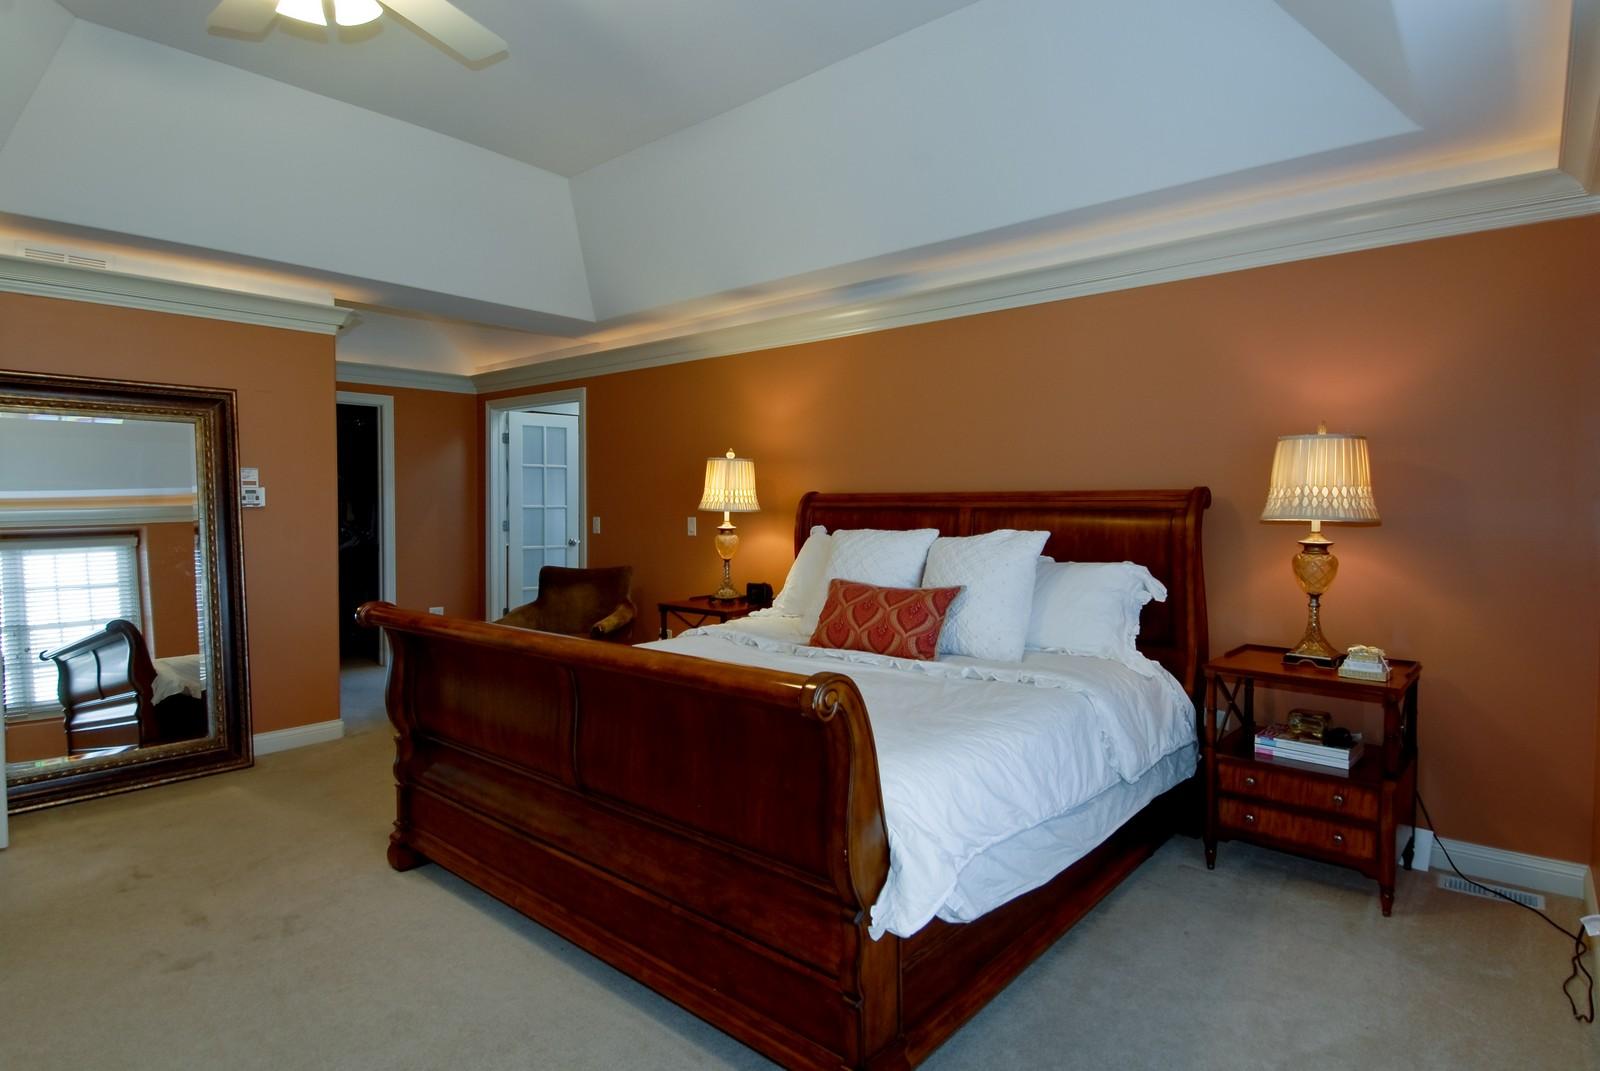 Real Estate Photography - 3839 Junebreeze Ln, Naperville, IL, 60564 - Master Bedroom